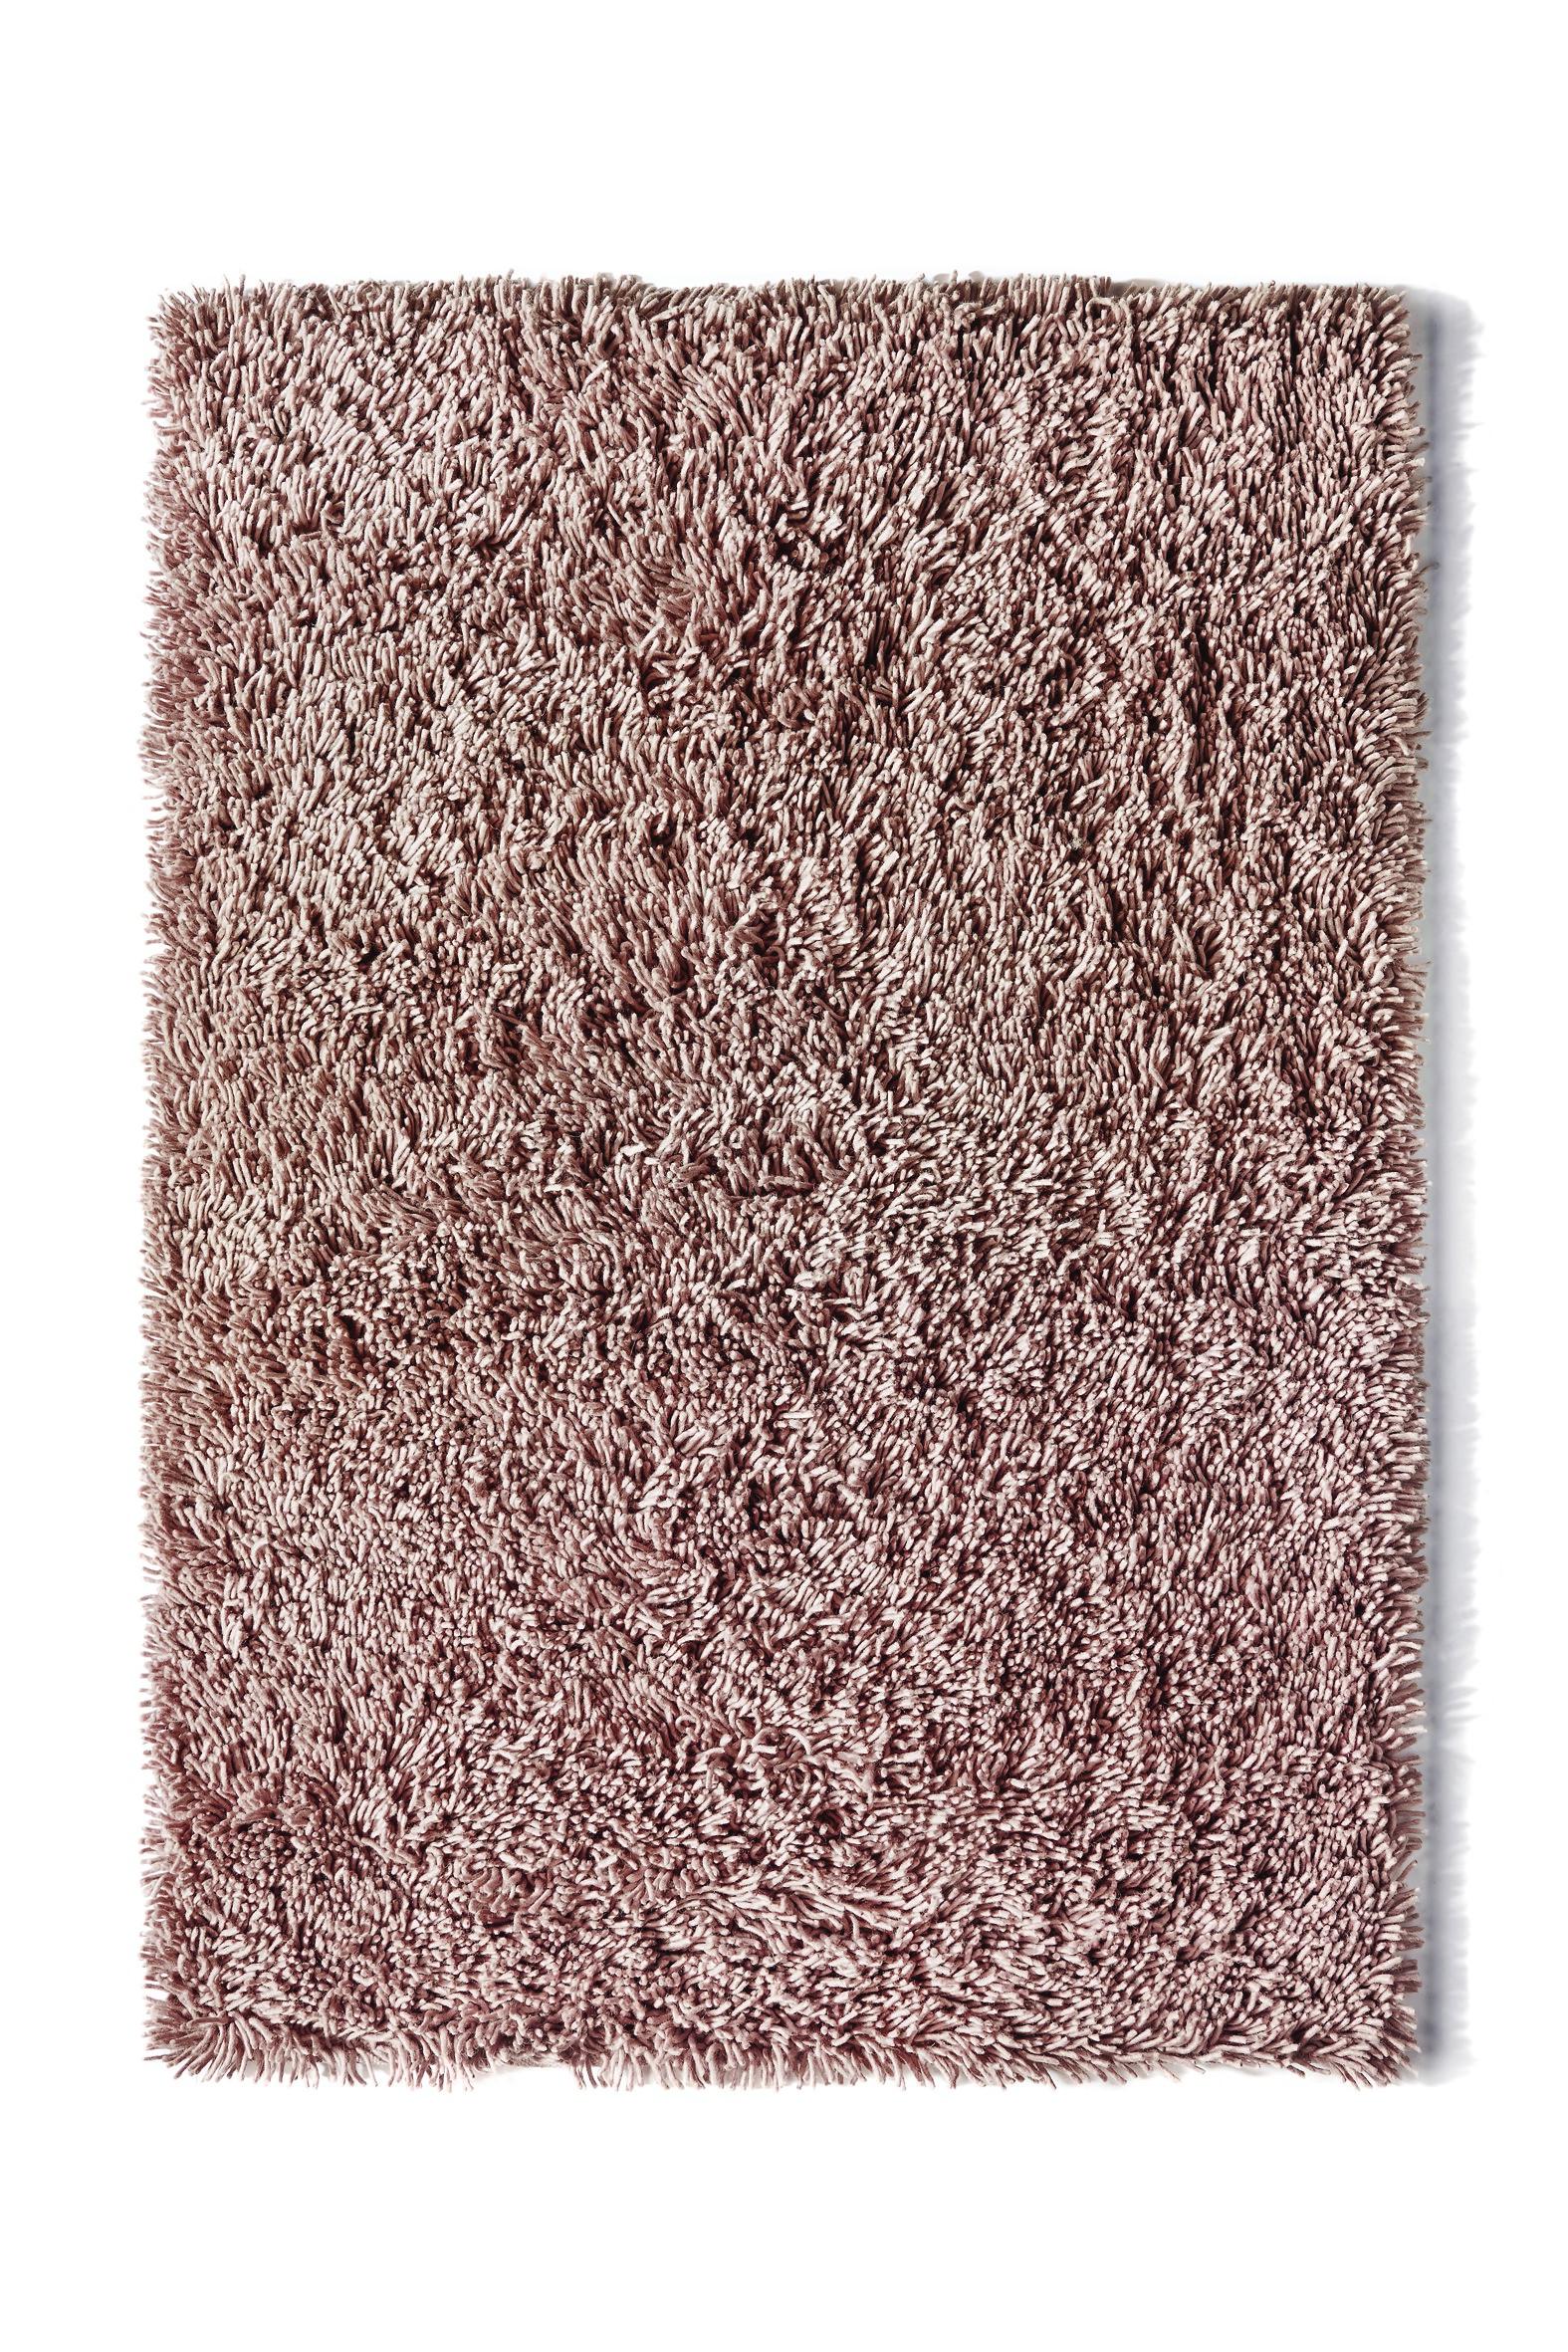 Sample of Firth Carpets Empire range rug